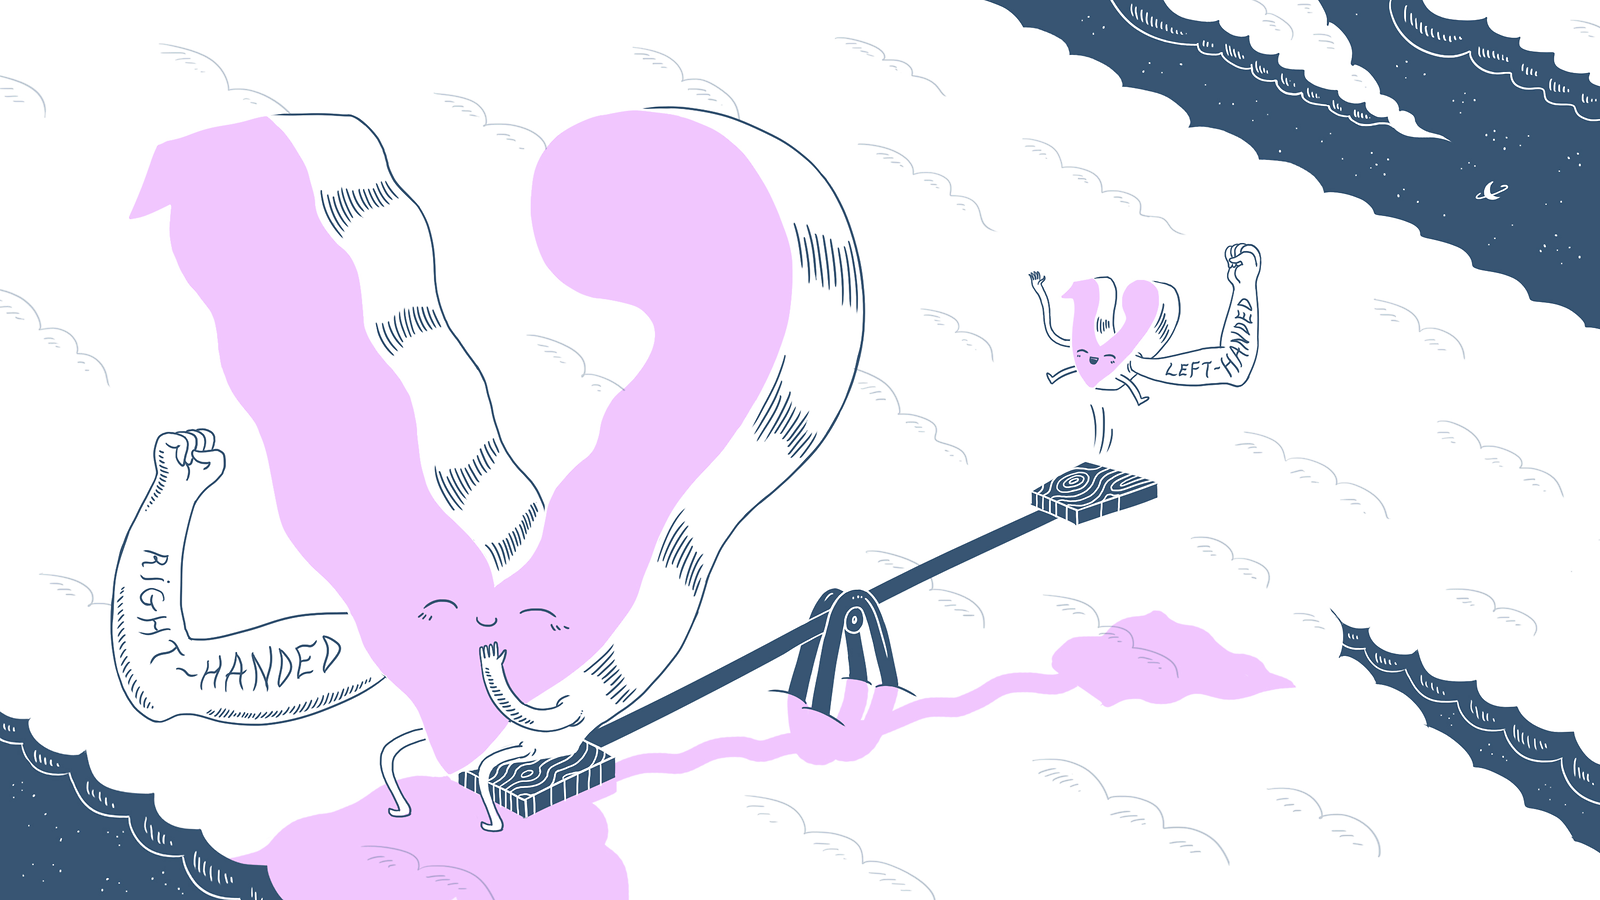 Neutrinos on a seesaw